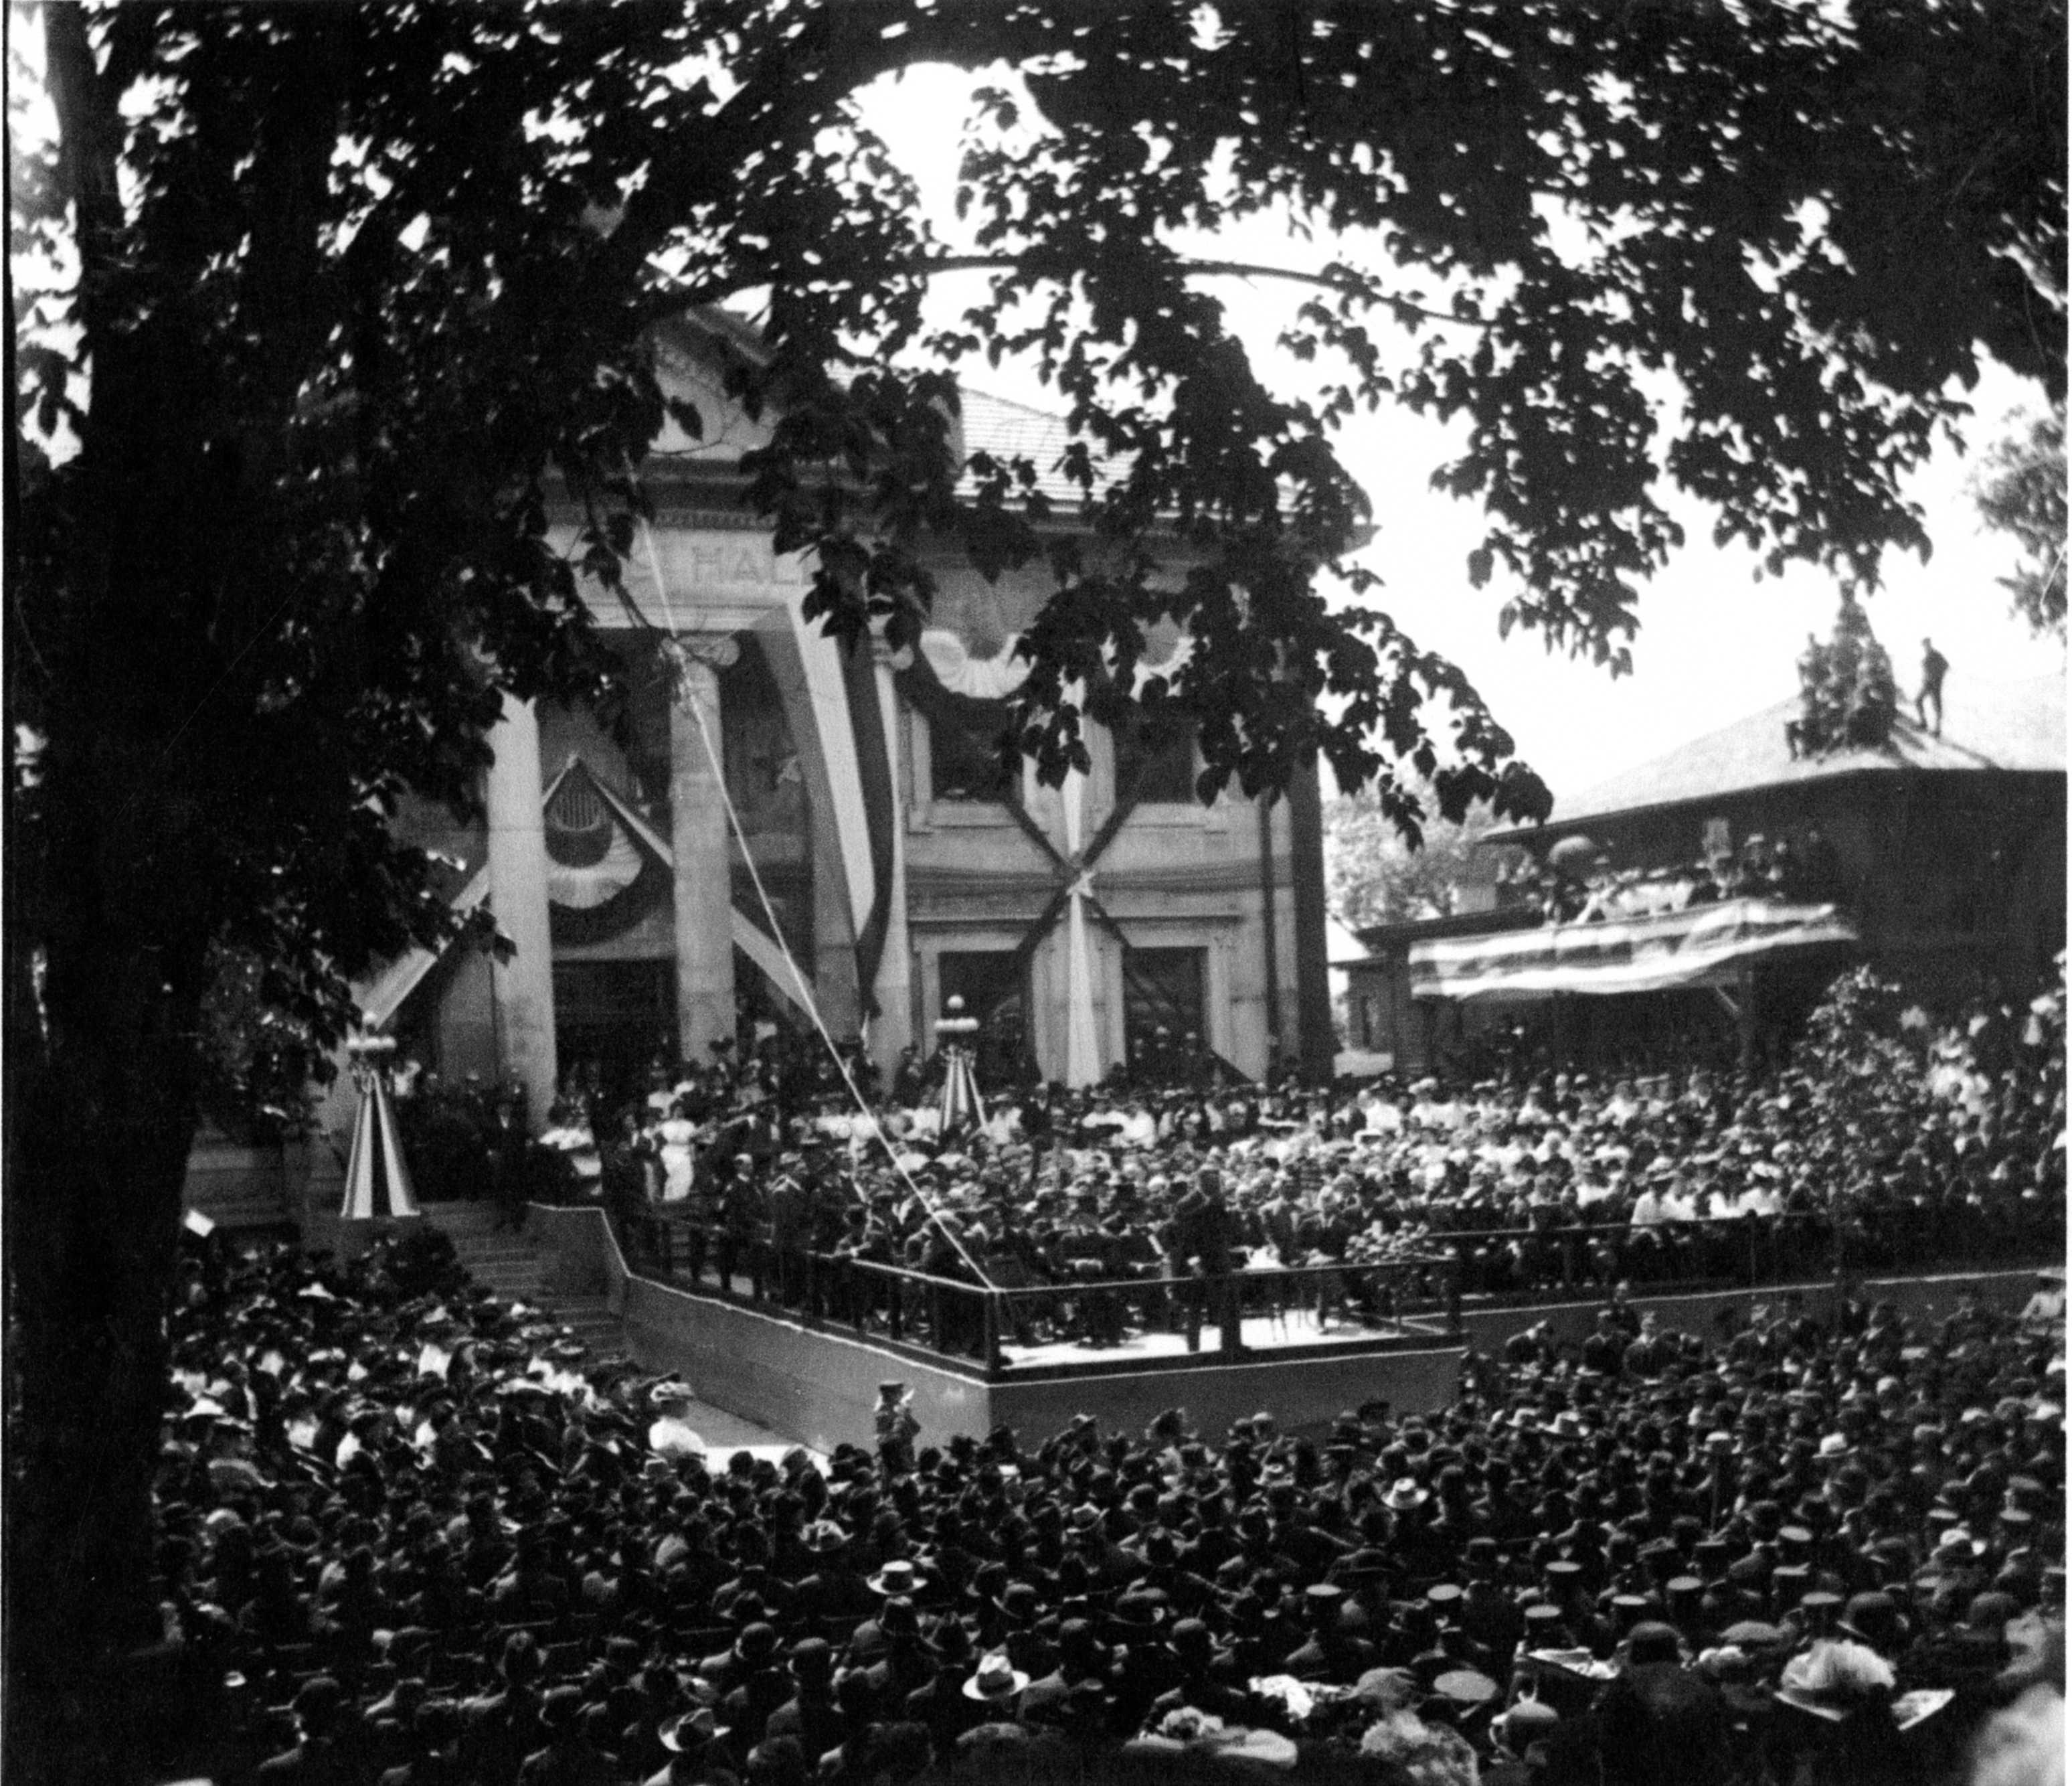 June 1903 Dedication by President T. Roosevelt